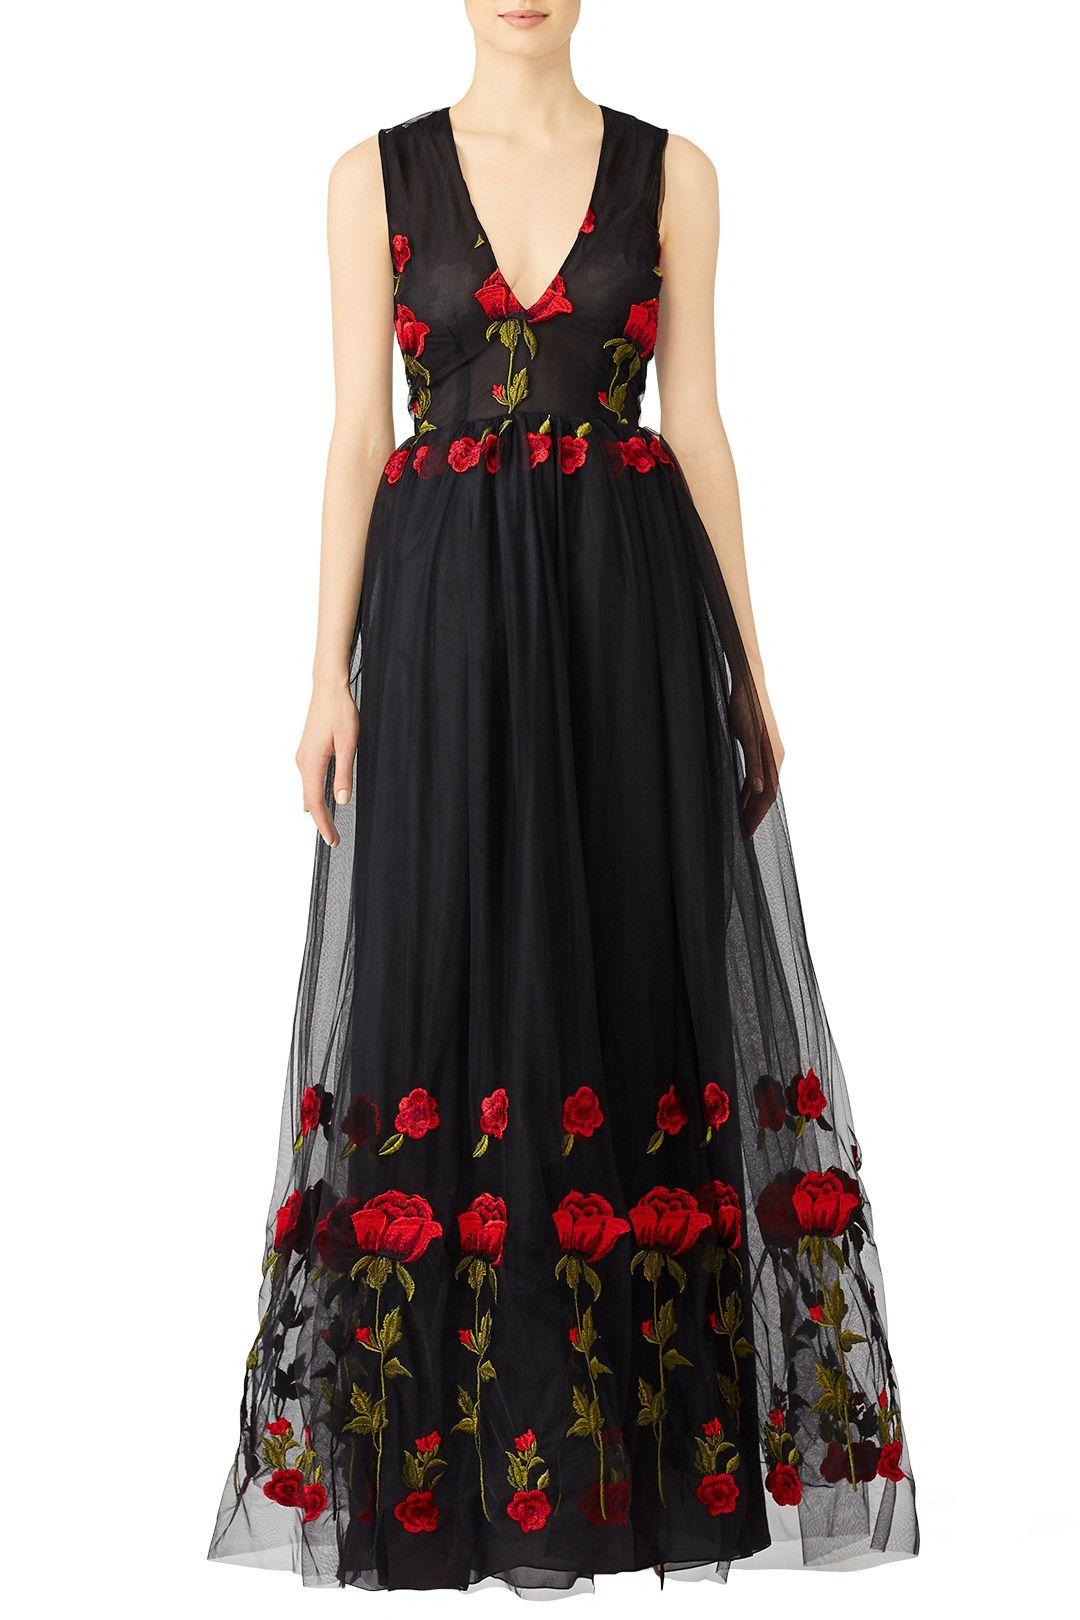 fff24bd931d Prom Dress Rental Stores In Nyc - Gomes Weine AG